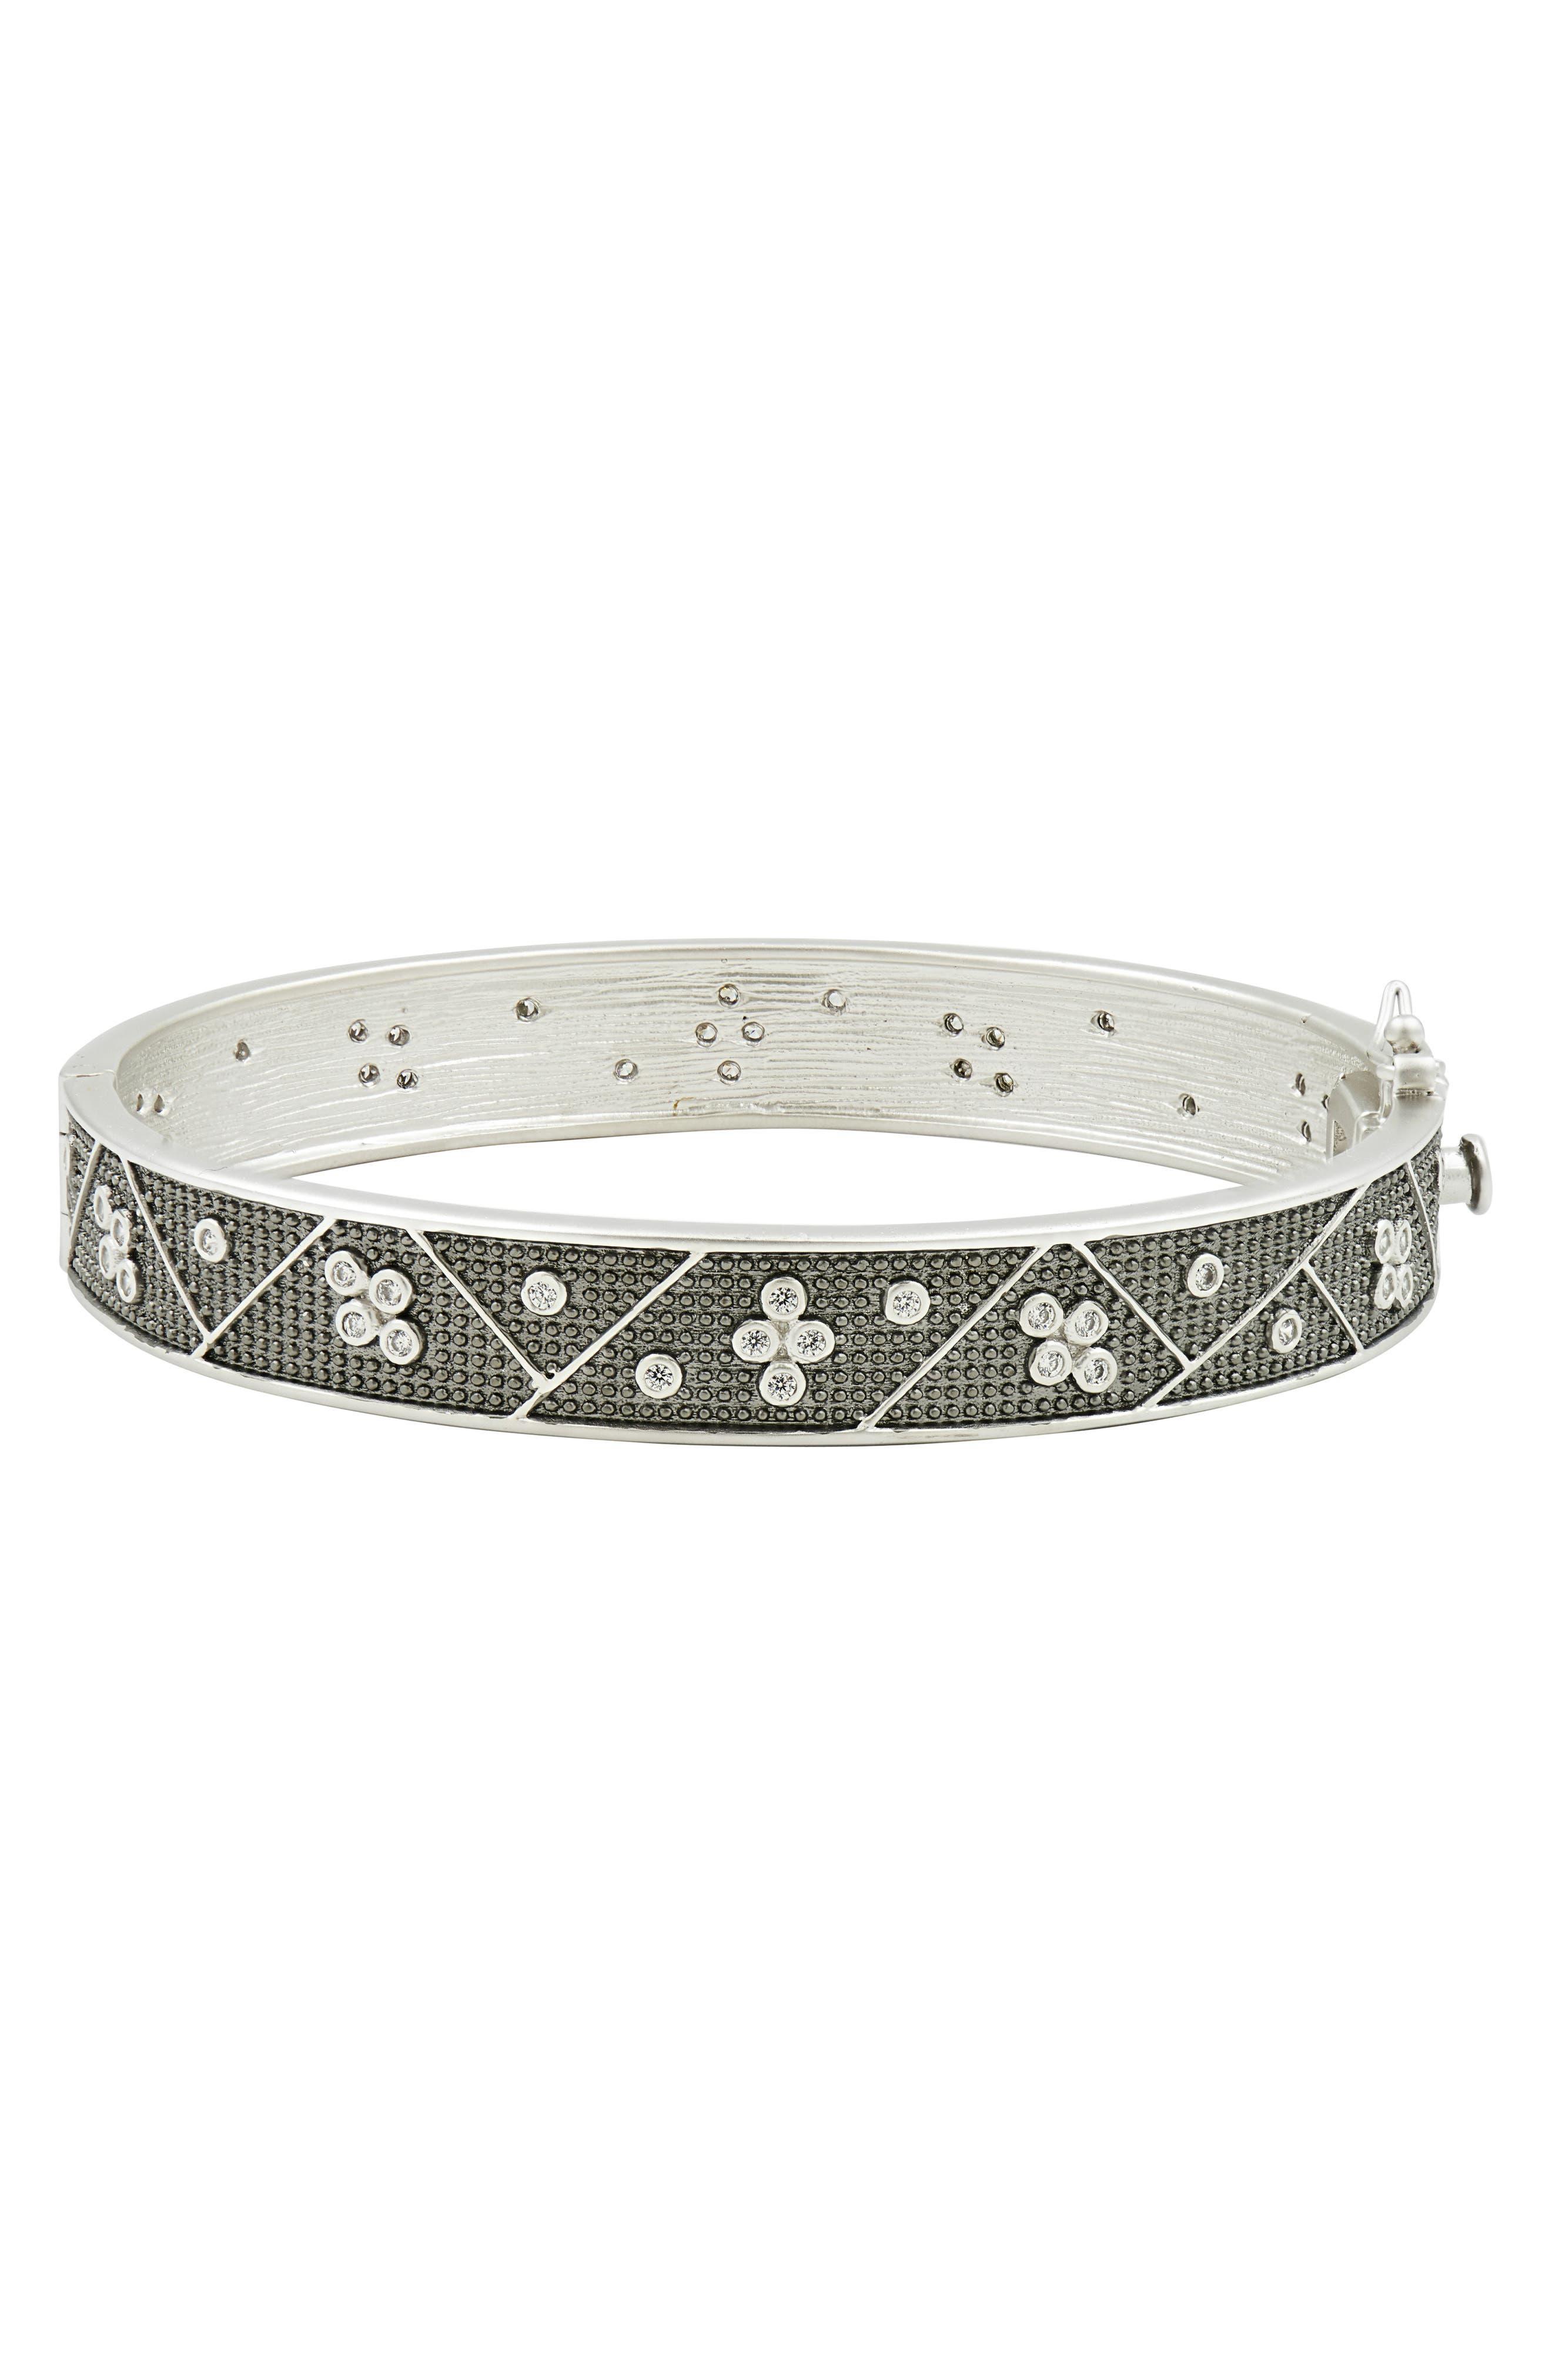 Industrial Finish Bangle Bracelet,                         Main,                         color, Black/ Silver